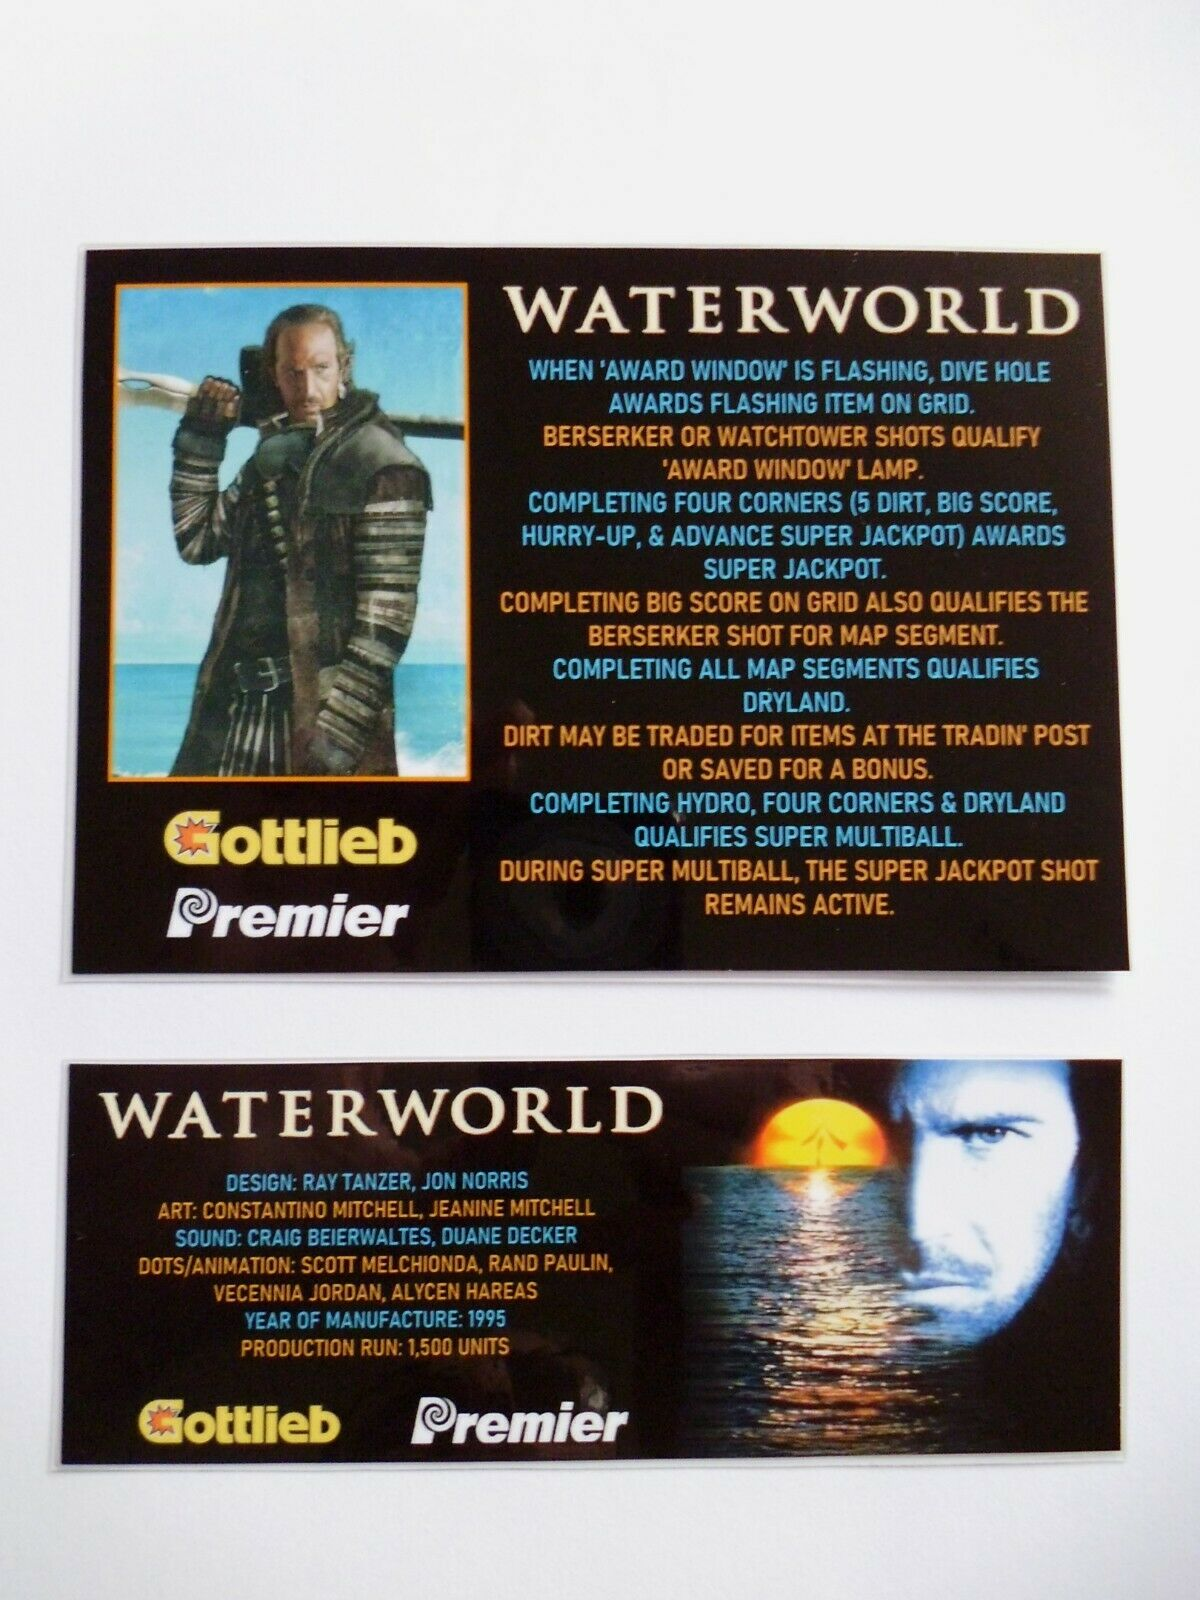 * 'WATERWORLD' Gottlieb 1995 Custom Instruction/Apron Cards * (New)